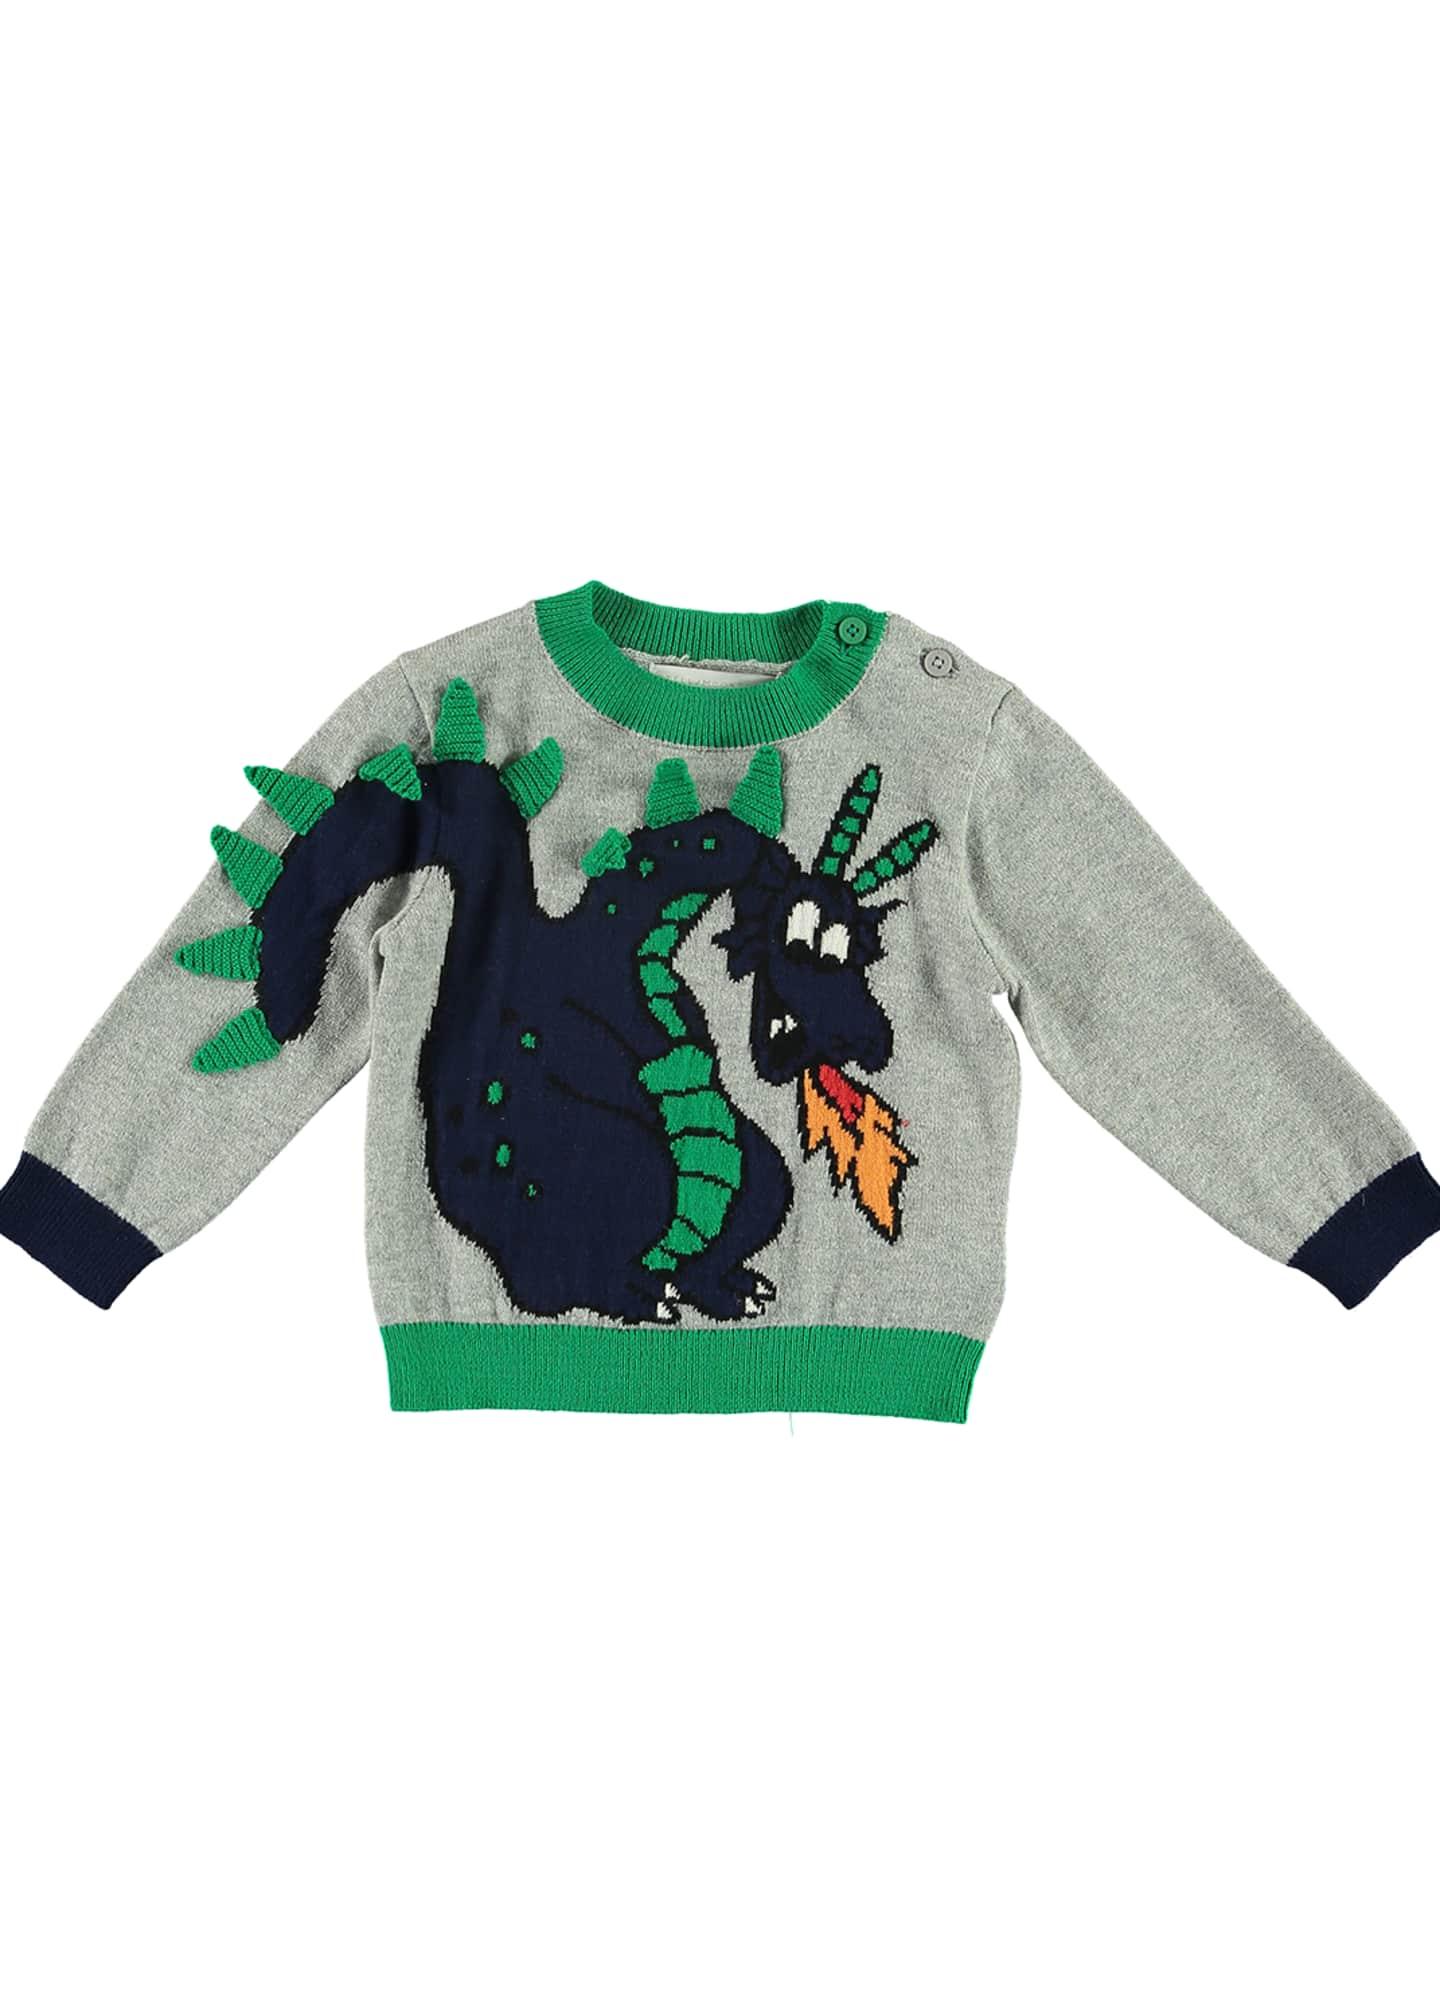 Stella McCartney Kids Boy's Dragon Knit Sweater, Size